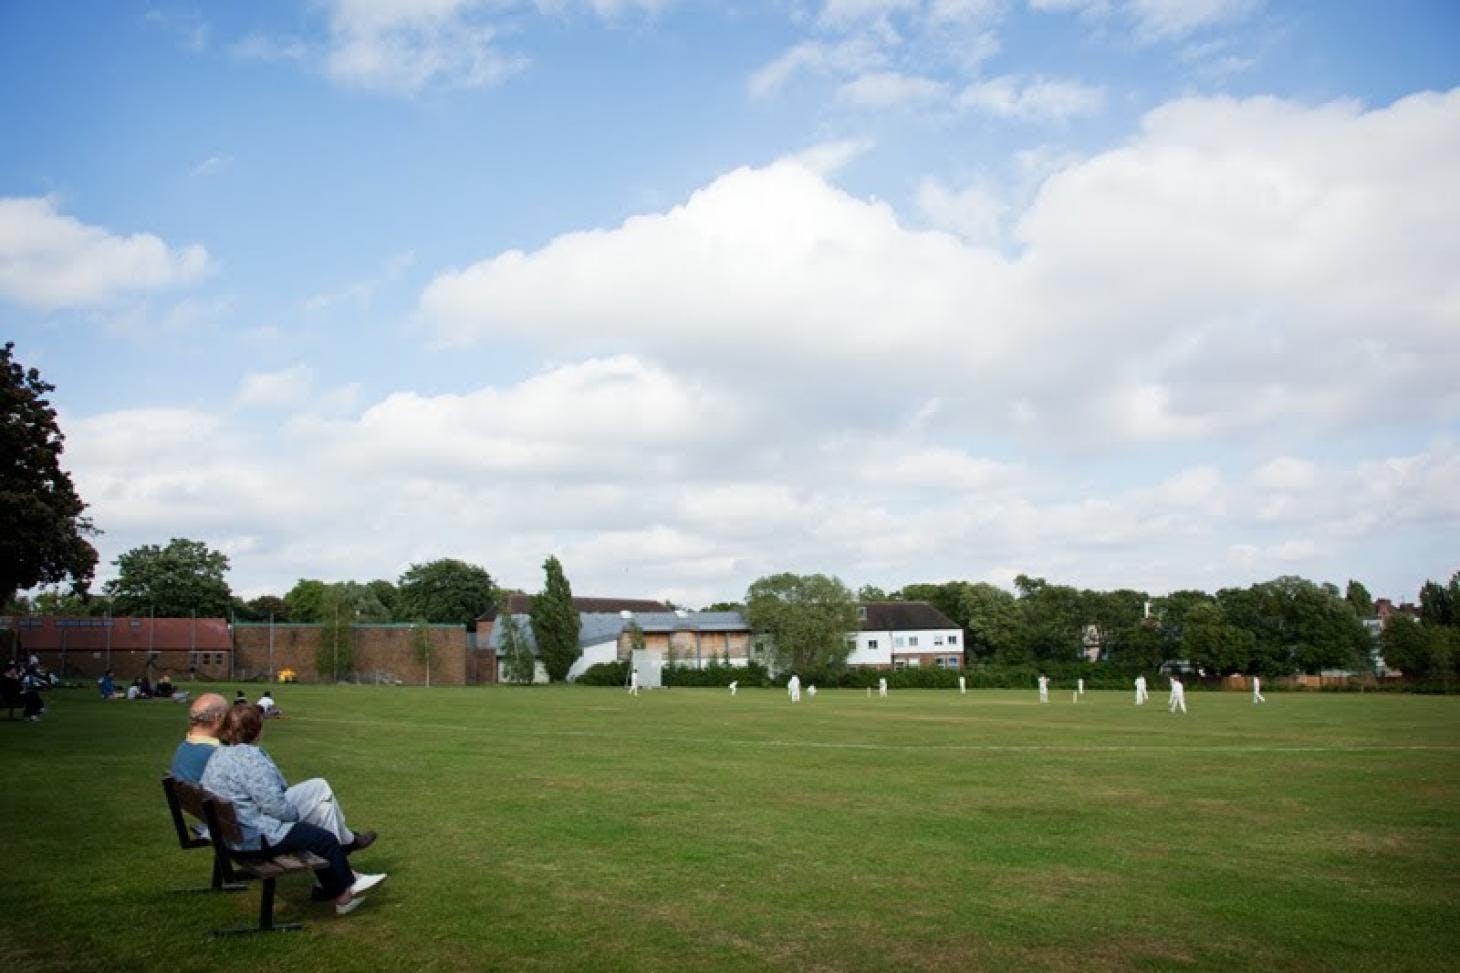 Parliament Hill Nets | Artificial cricket facilities